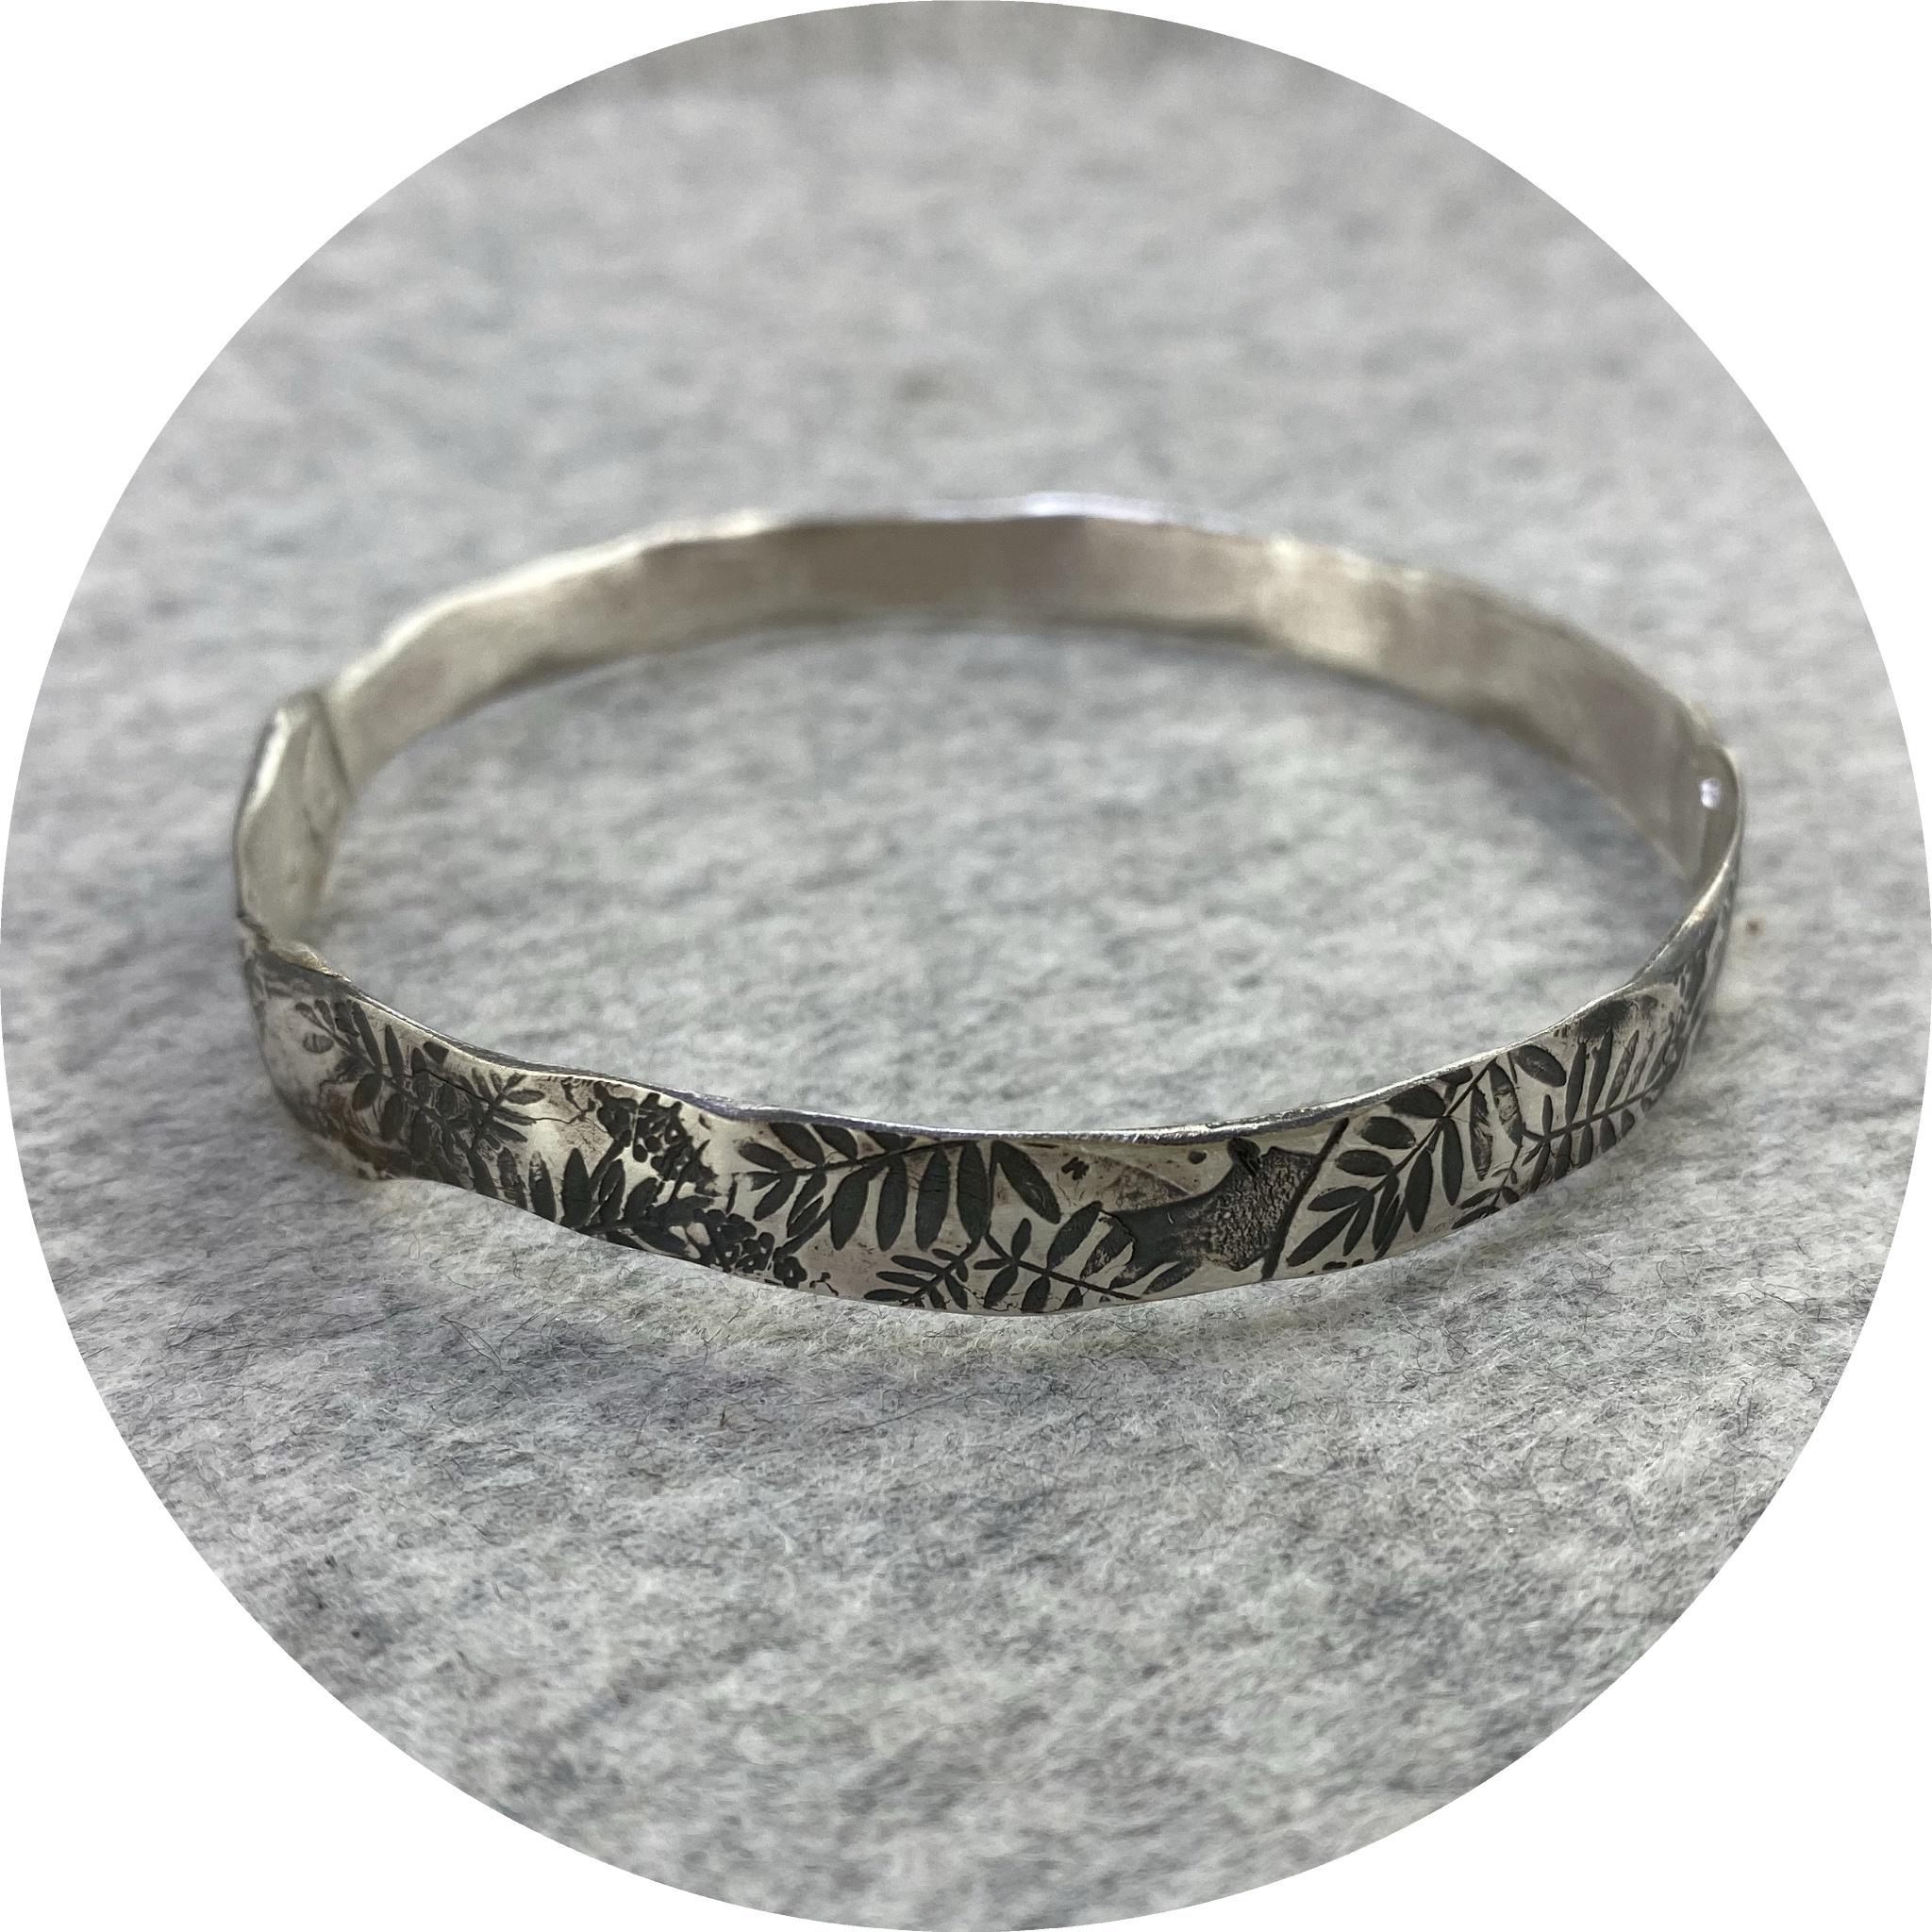 Claire Taylor - 'Oxidised Leaf Bangle', 925 silver